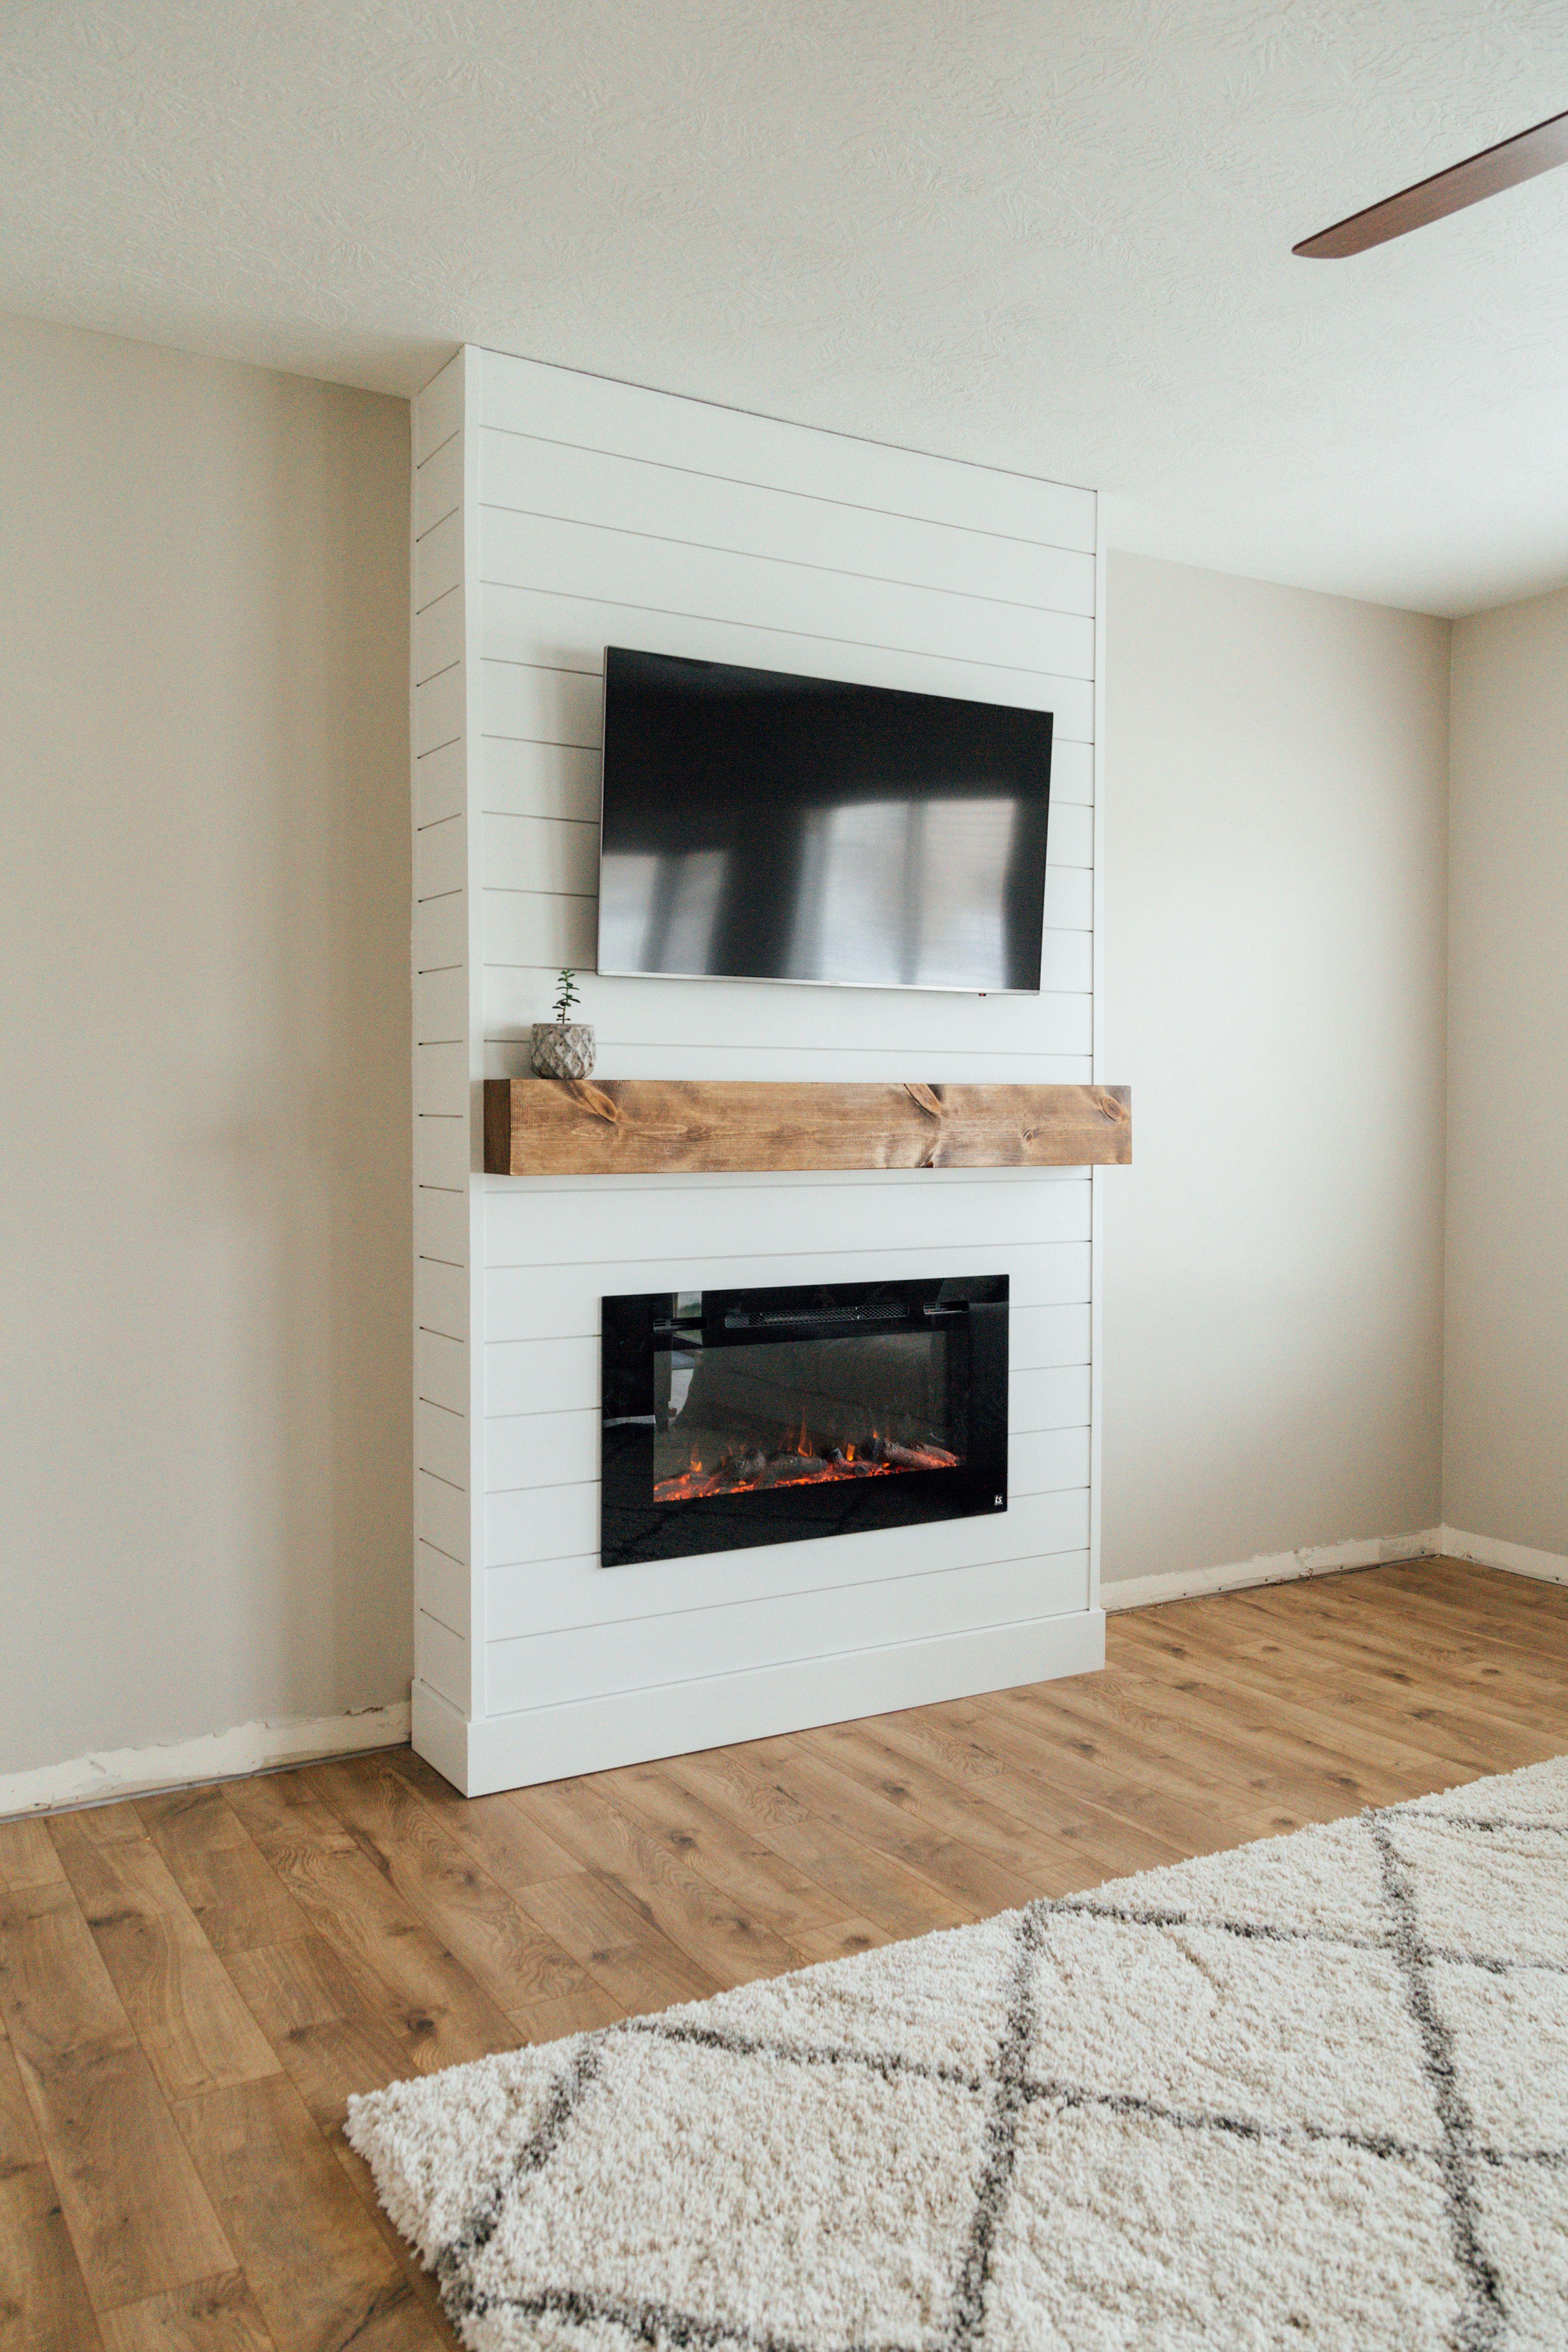 Diy Shiplap Fireplace Project Simple Shiplap Fireplace Electric